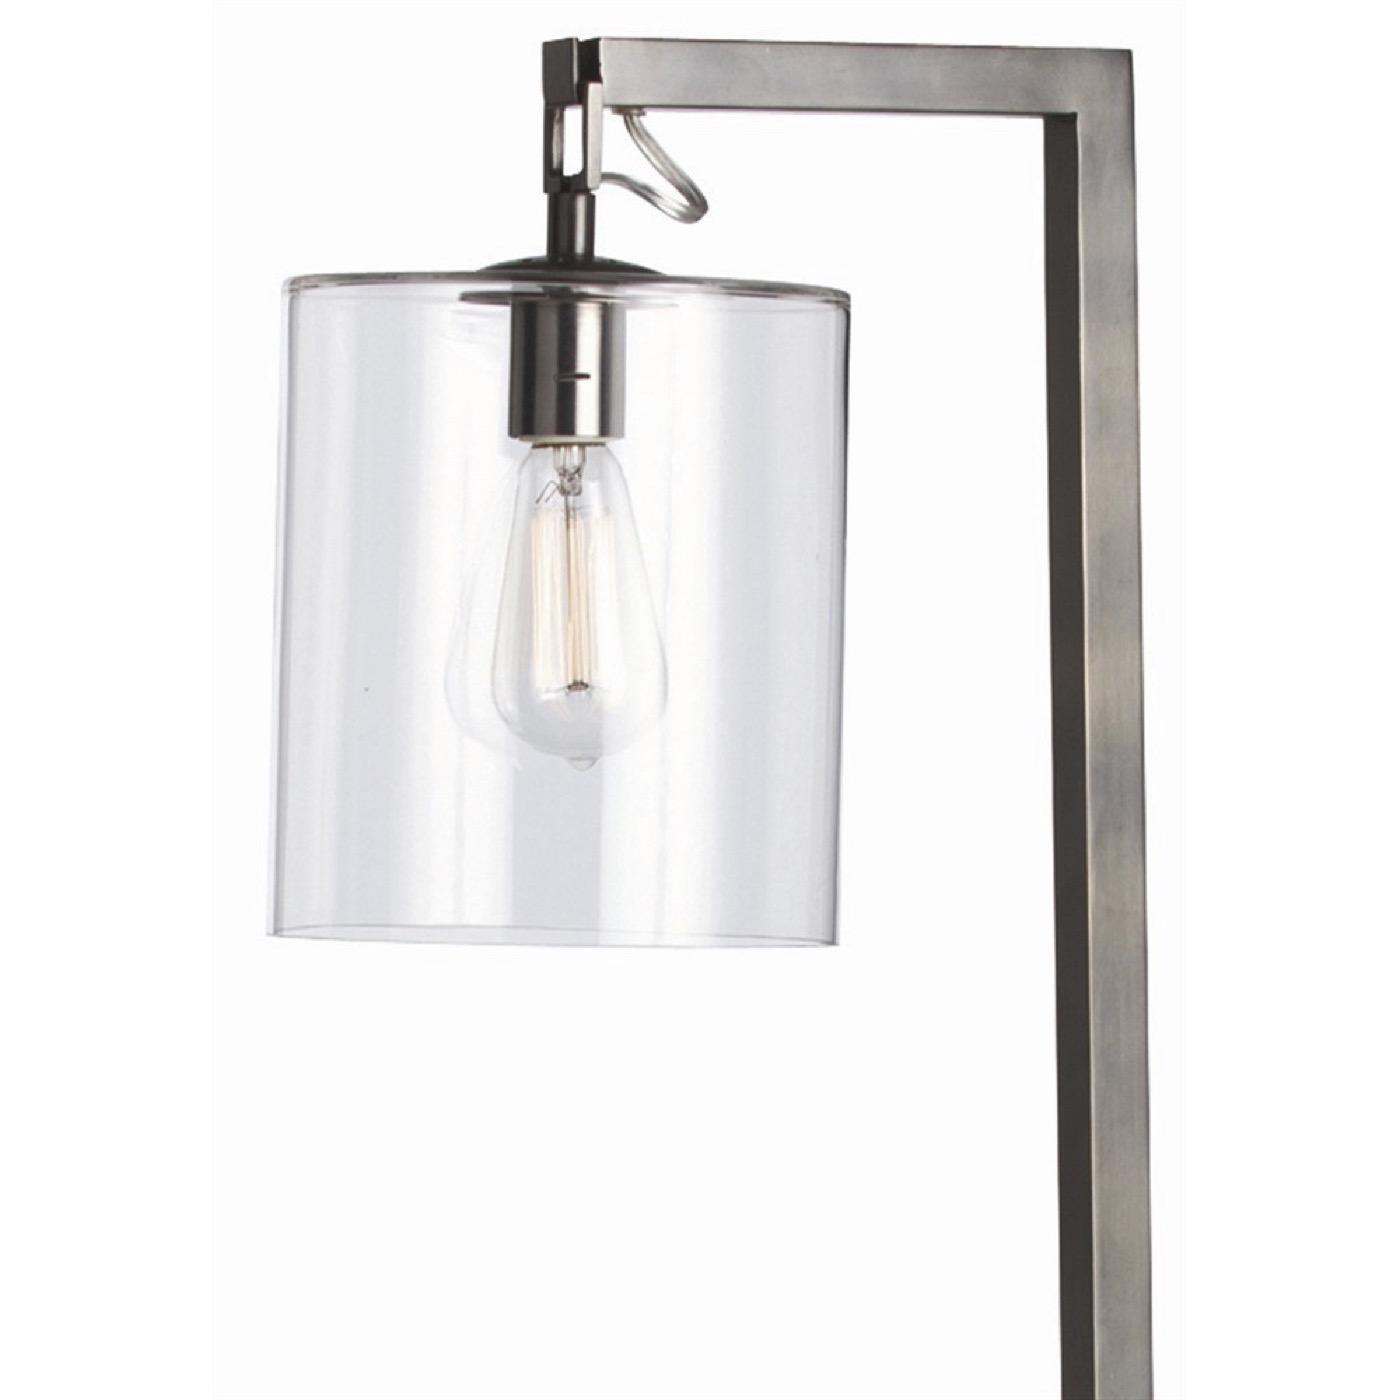 Bravado Iron Floor Lamp